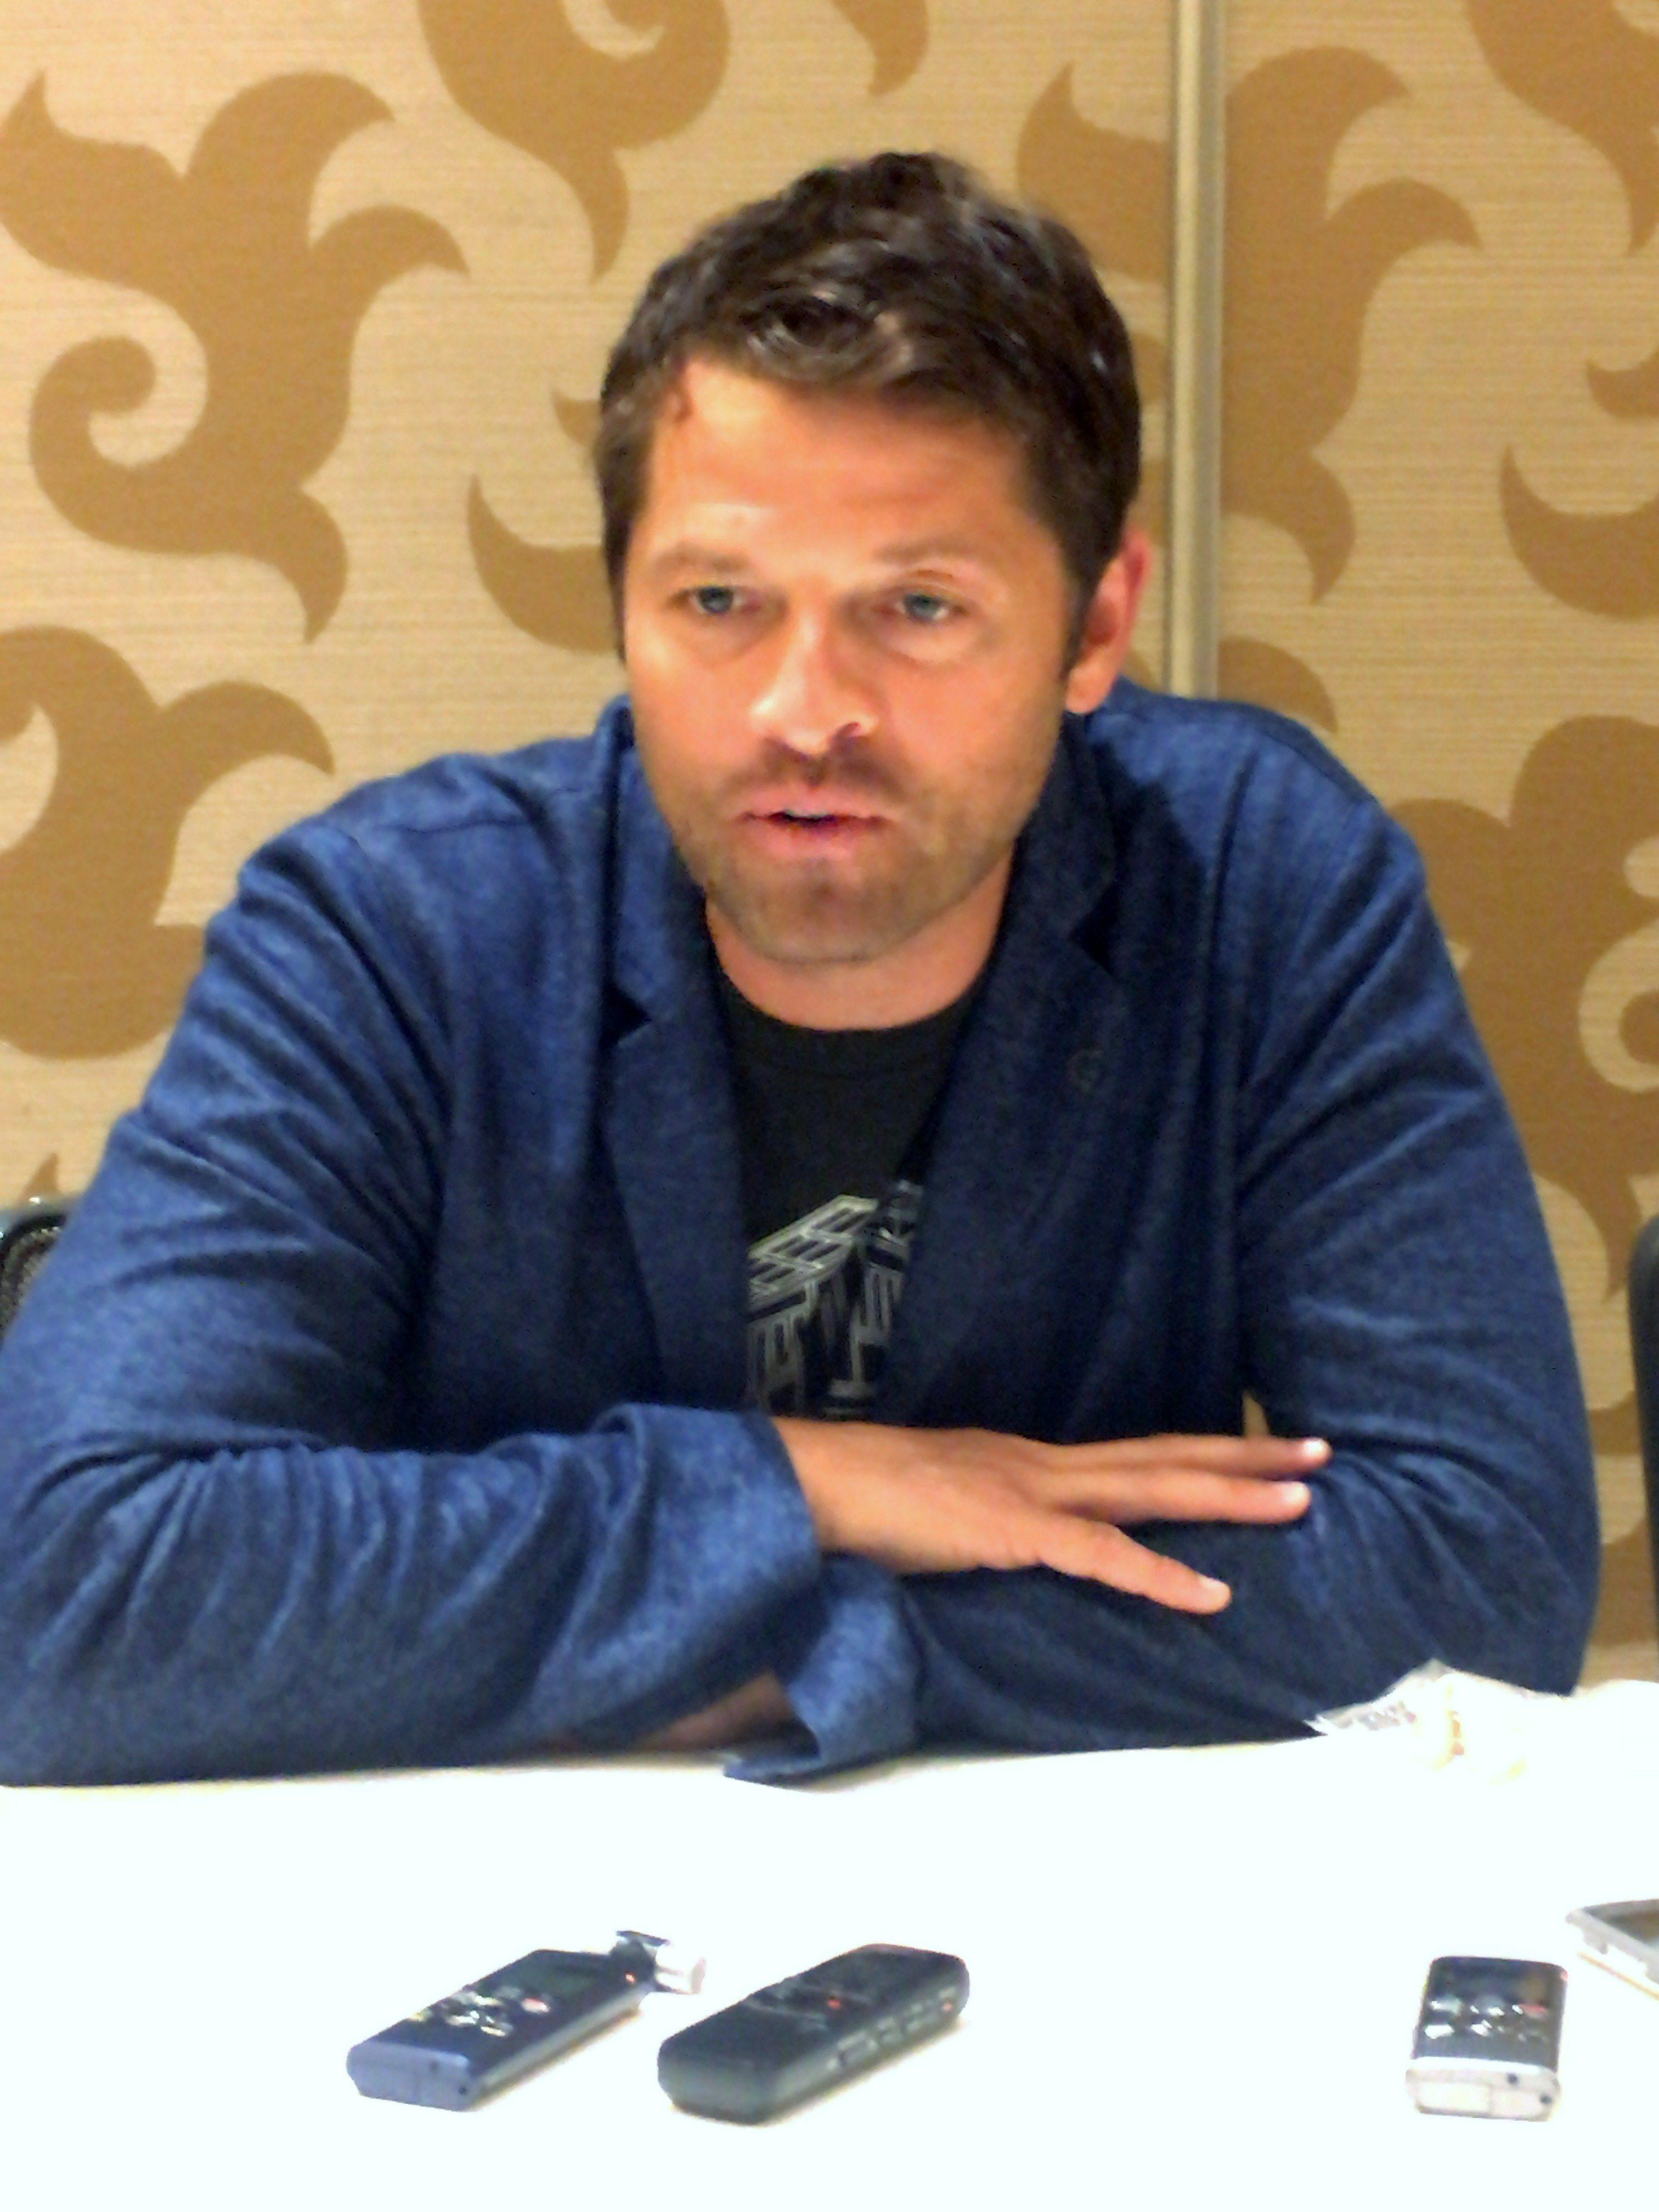 Comic-Con 2017 Quick Takes: Misha Collins on Final GISHWHES